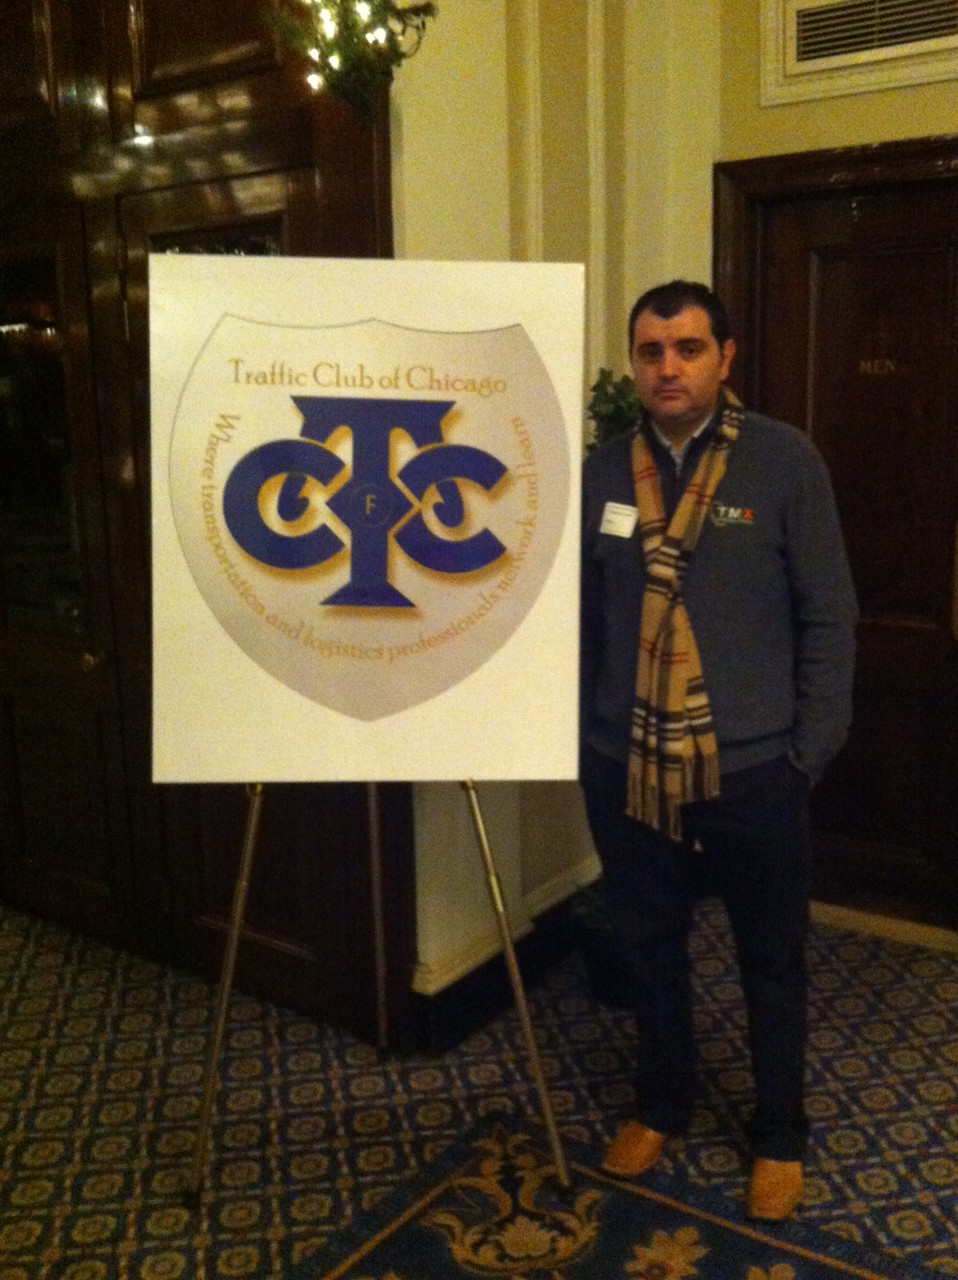 TMX Intermodal attends Traffic Club of Chicago Annual Holiday Reception